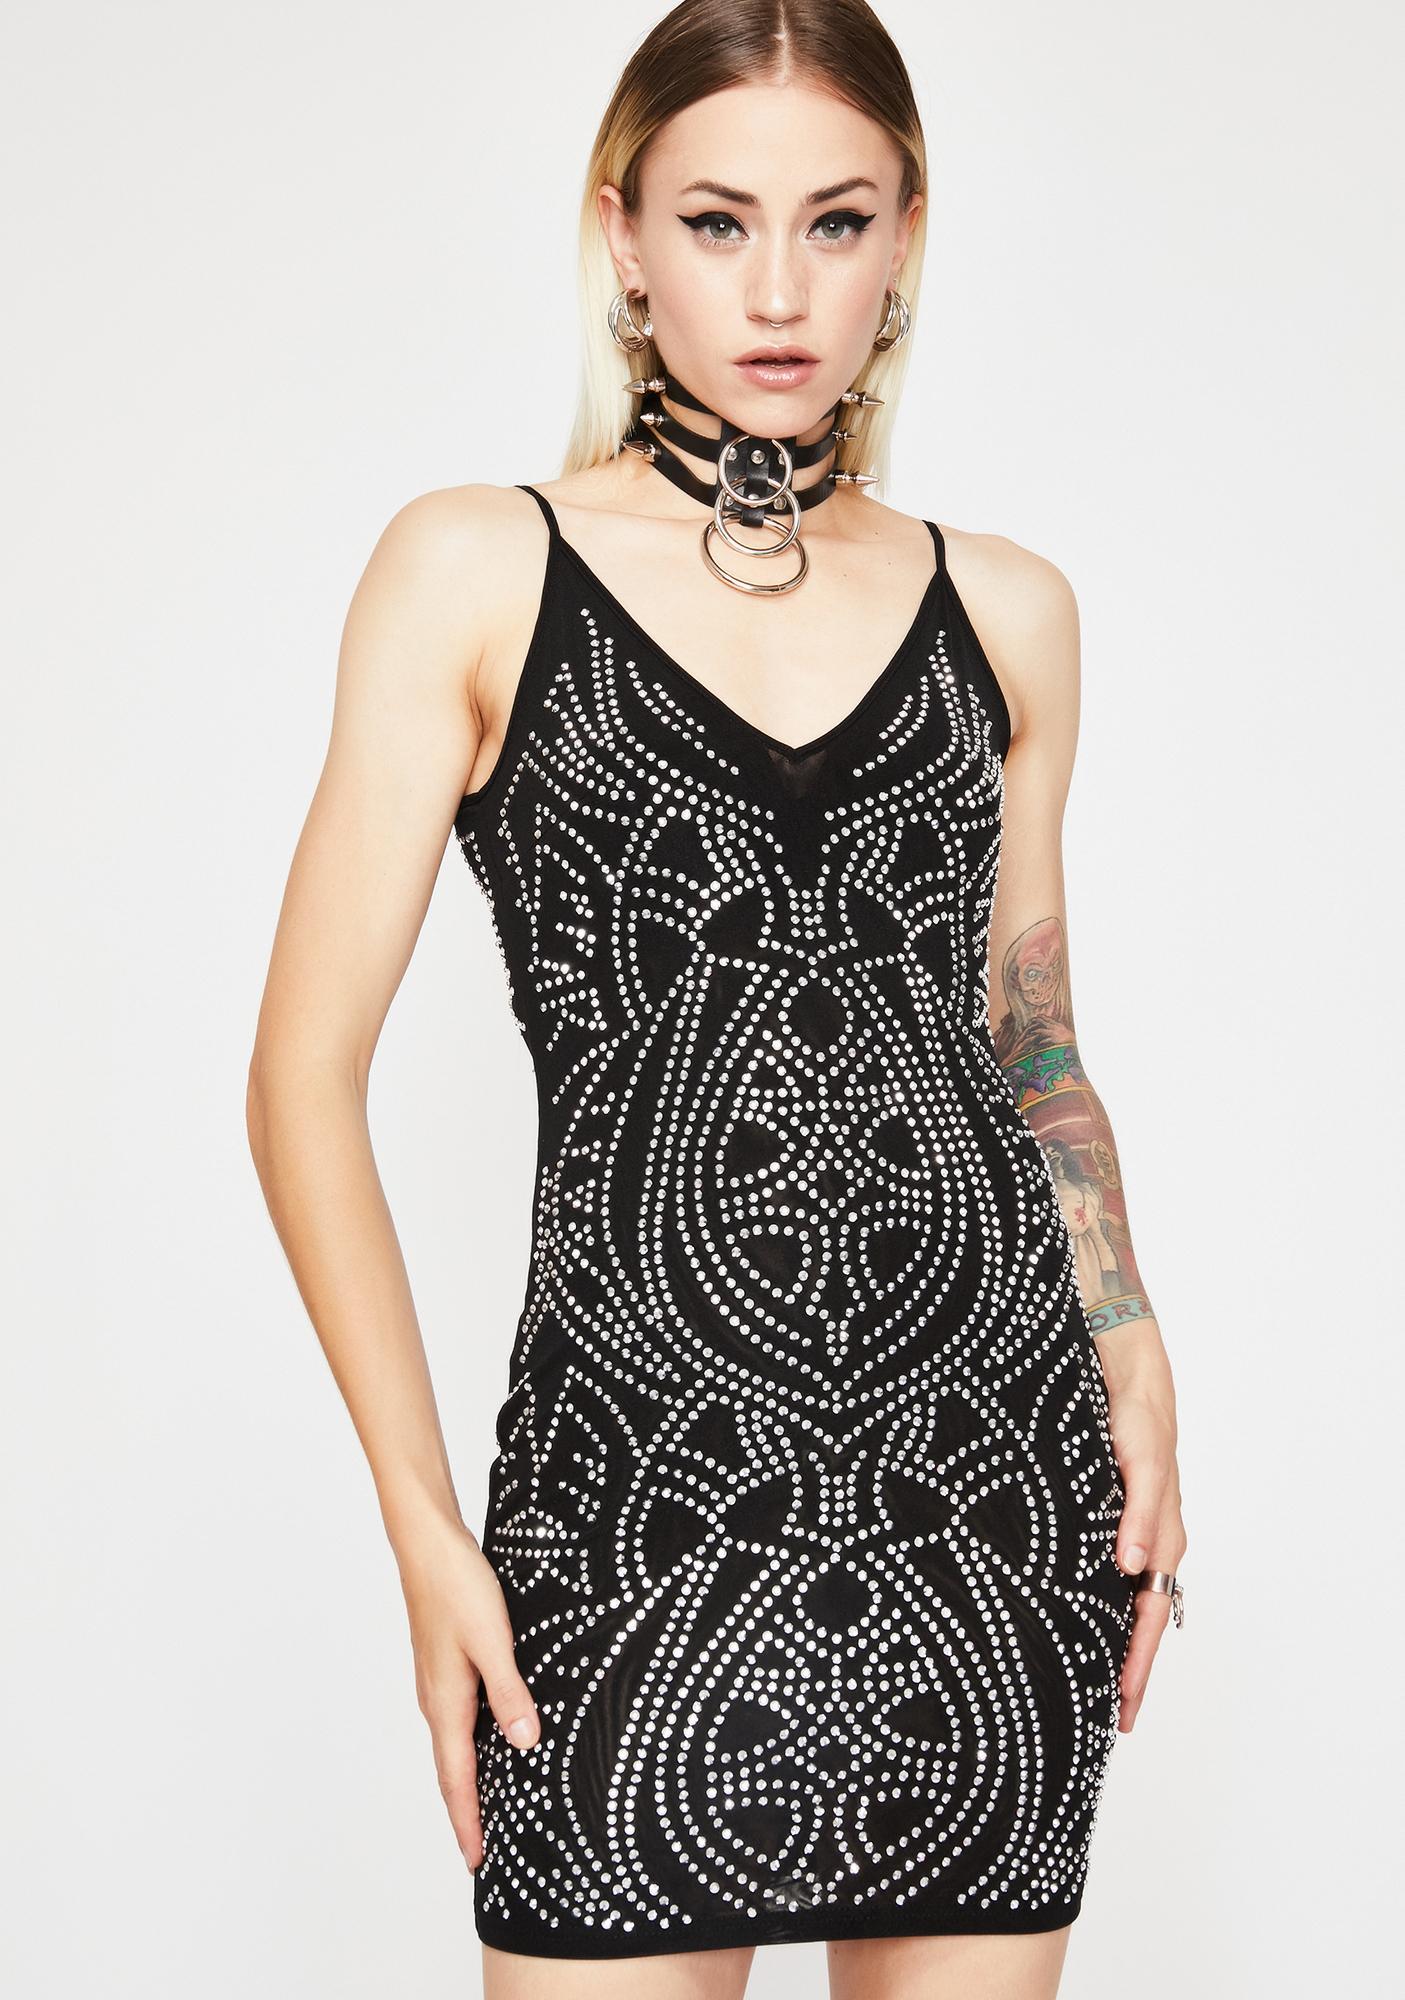 Your Loss Mini Dress